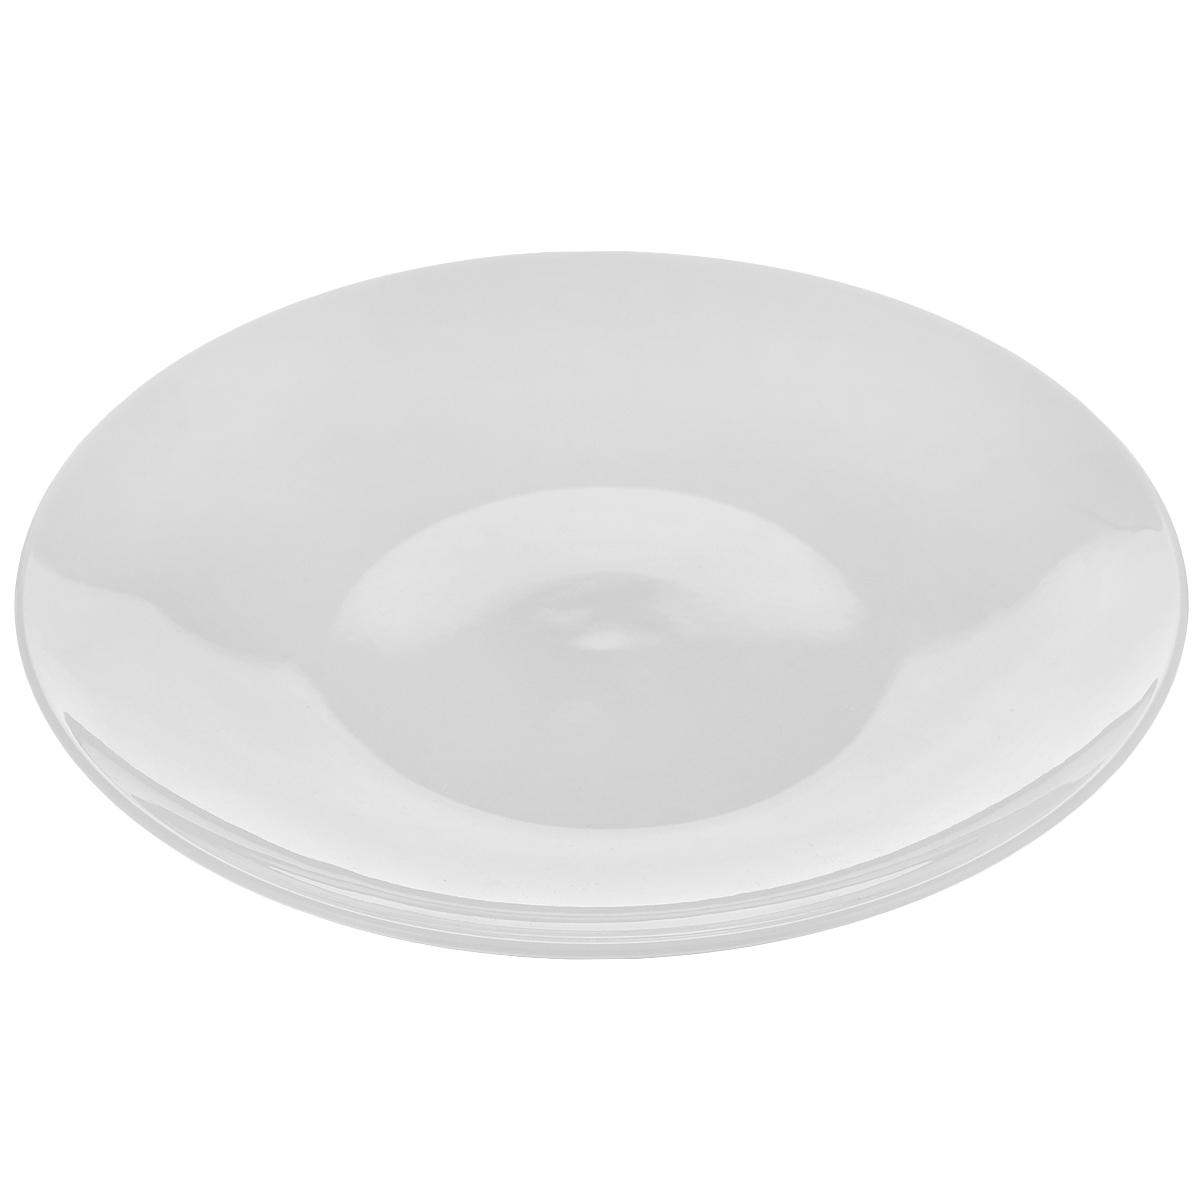 "Тарелка десертная Tescoma ""Crema"", диаметр 19,5 см ( 387020 )"